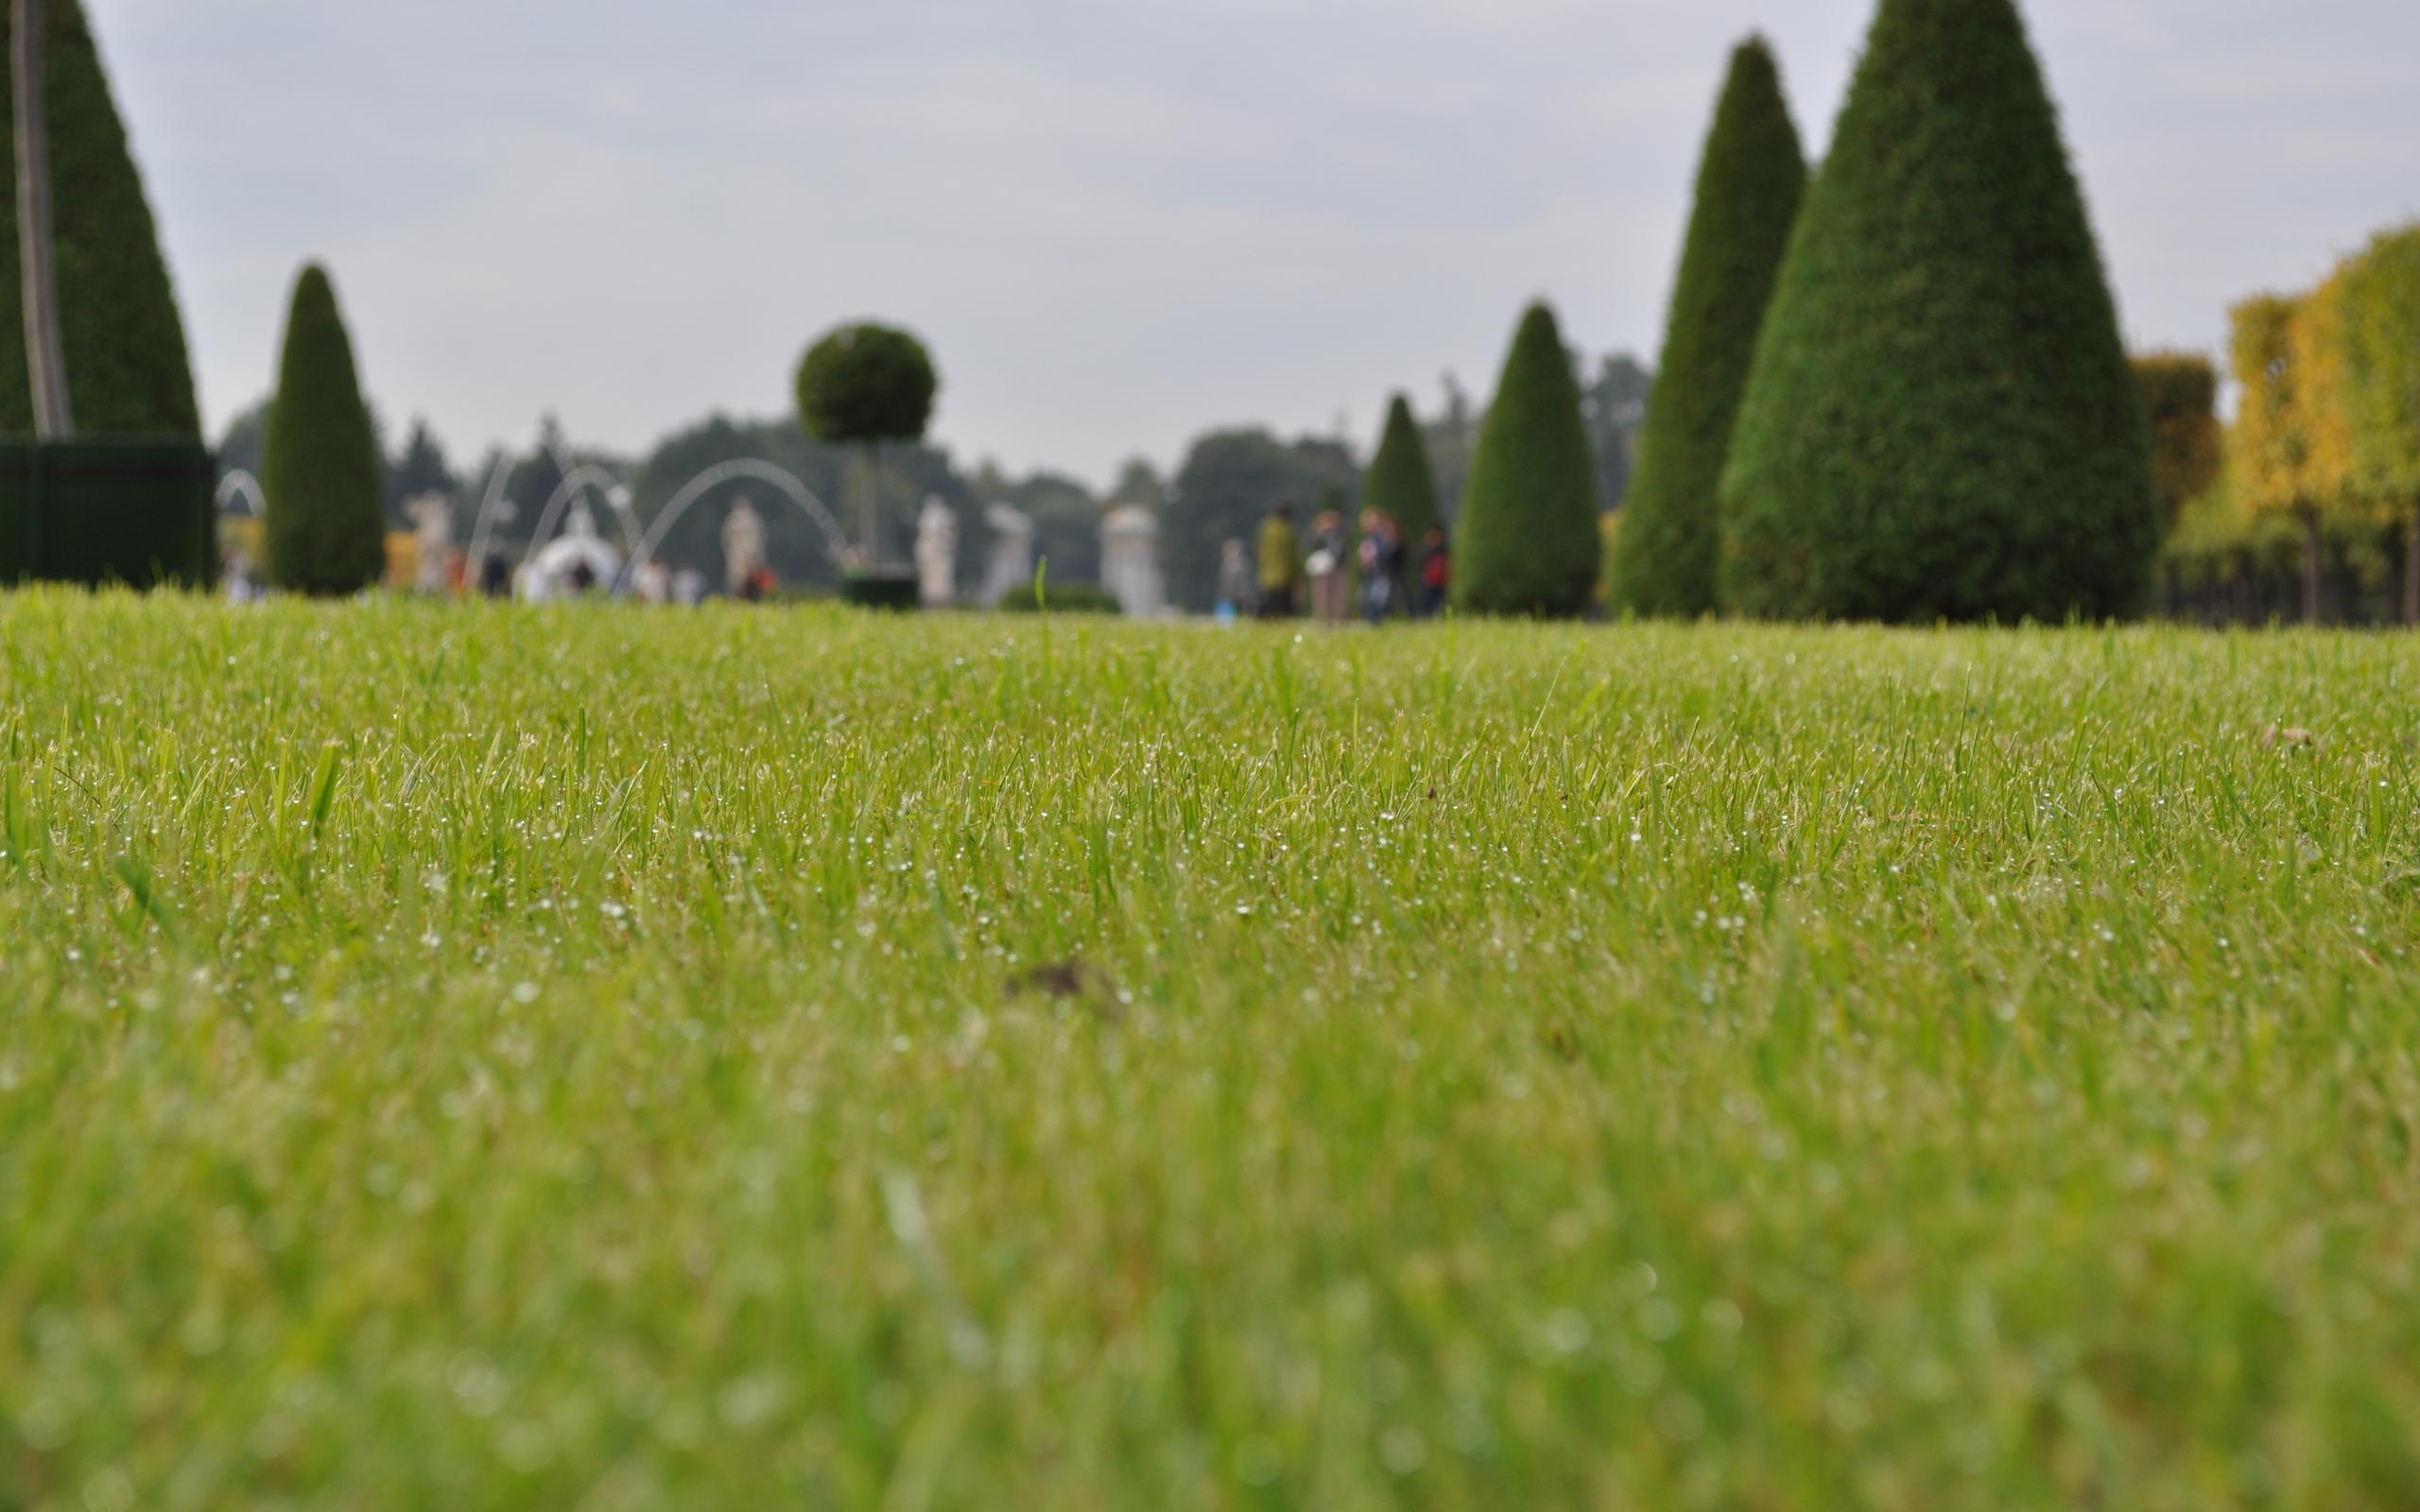 газон, трава, зеленый